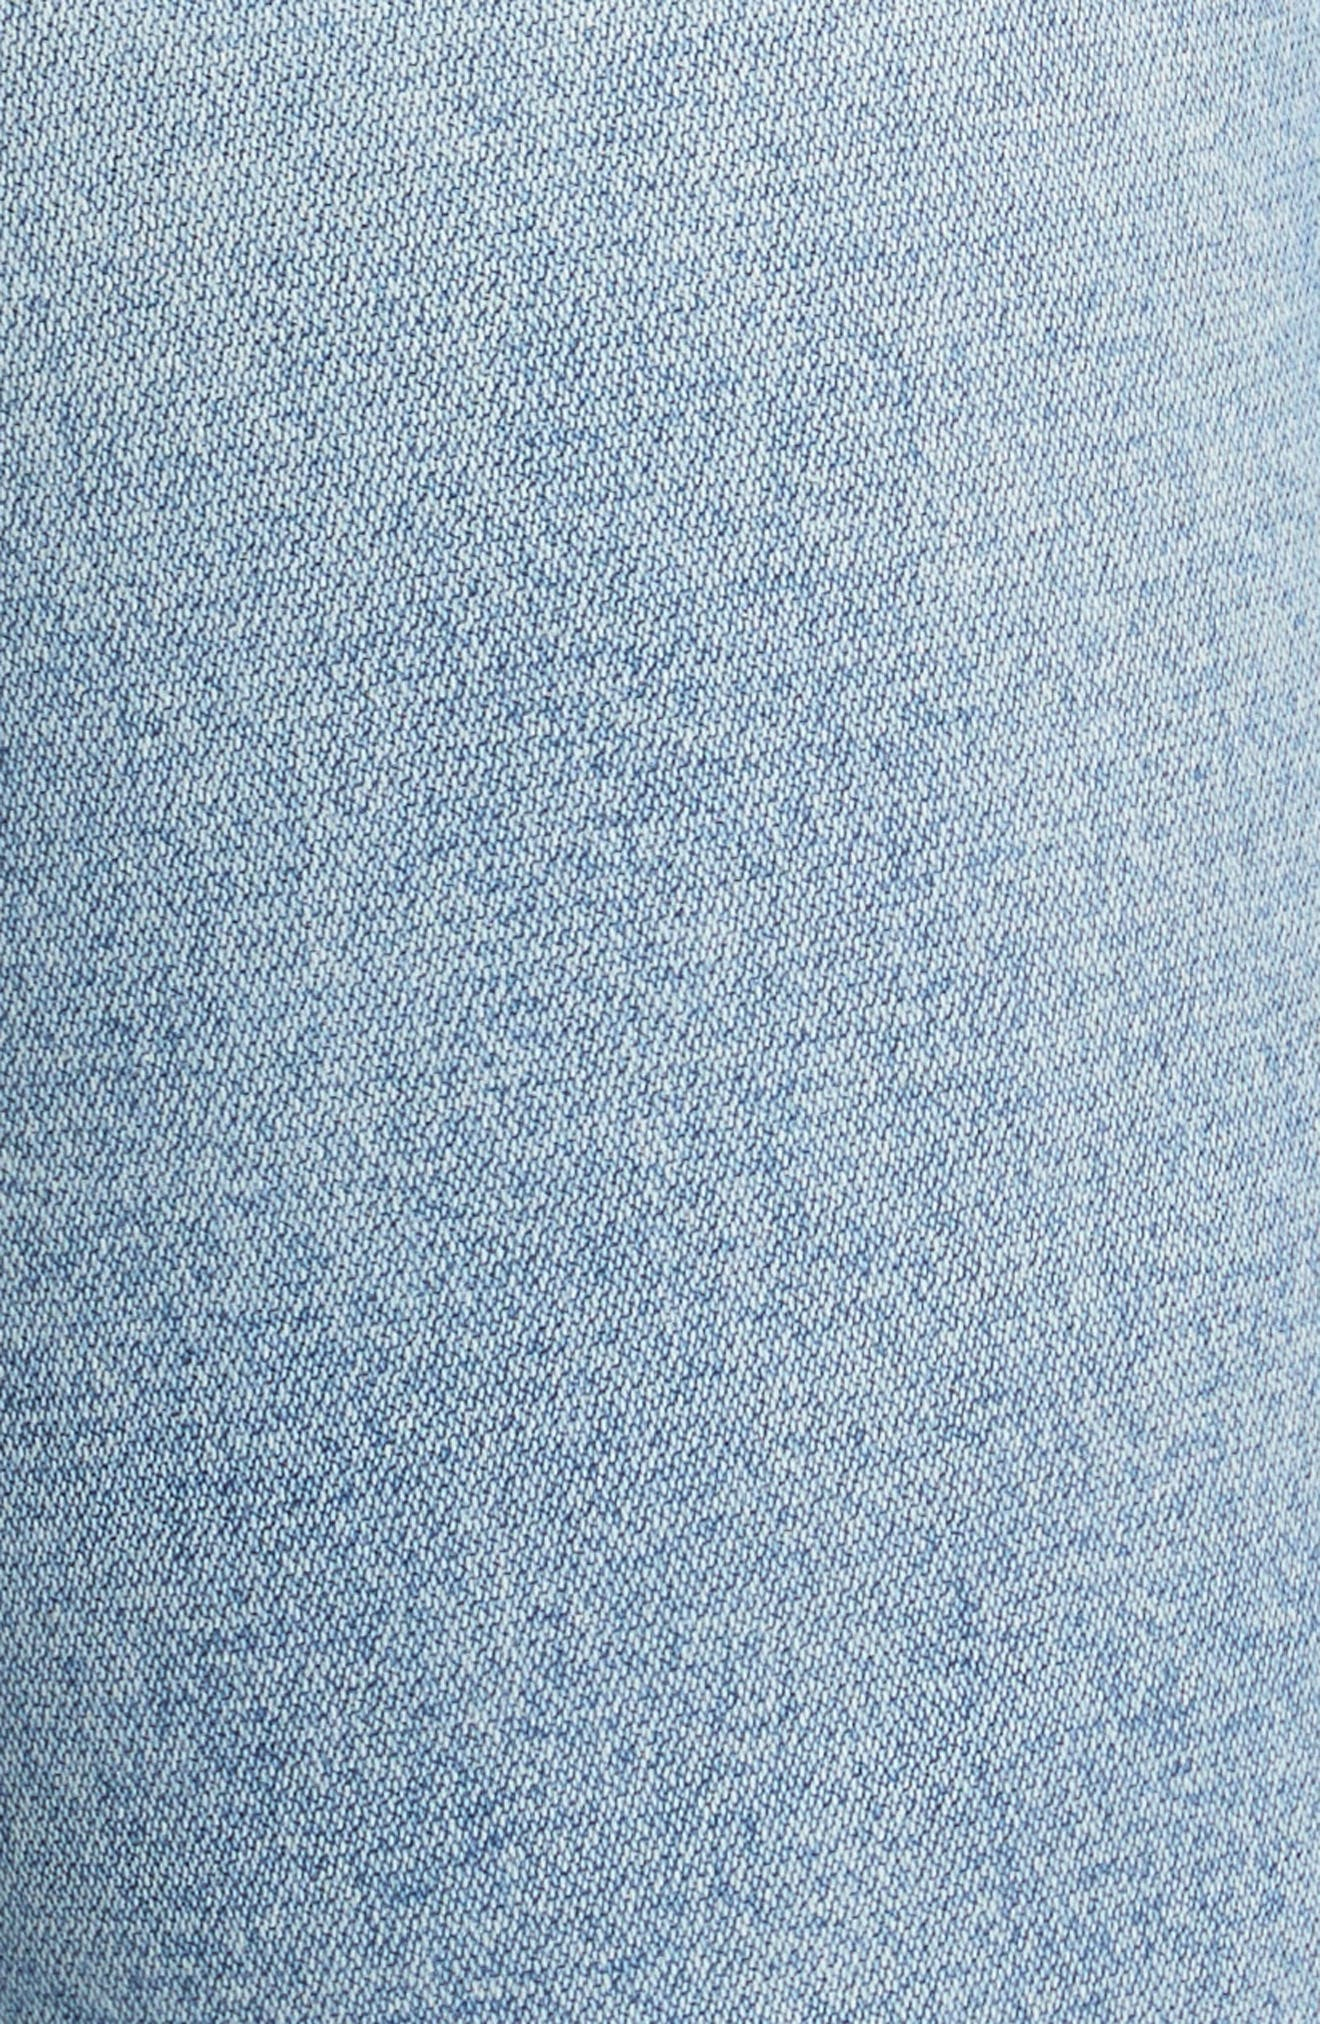 Alternate Image 6  - rag & bone/JEAN Lou High Waist Skinny Jeans (Hotbird)